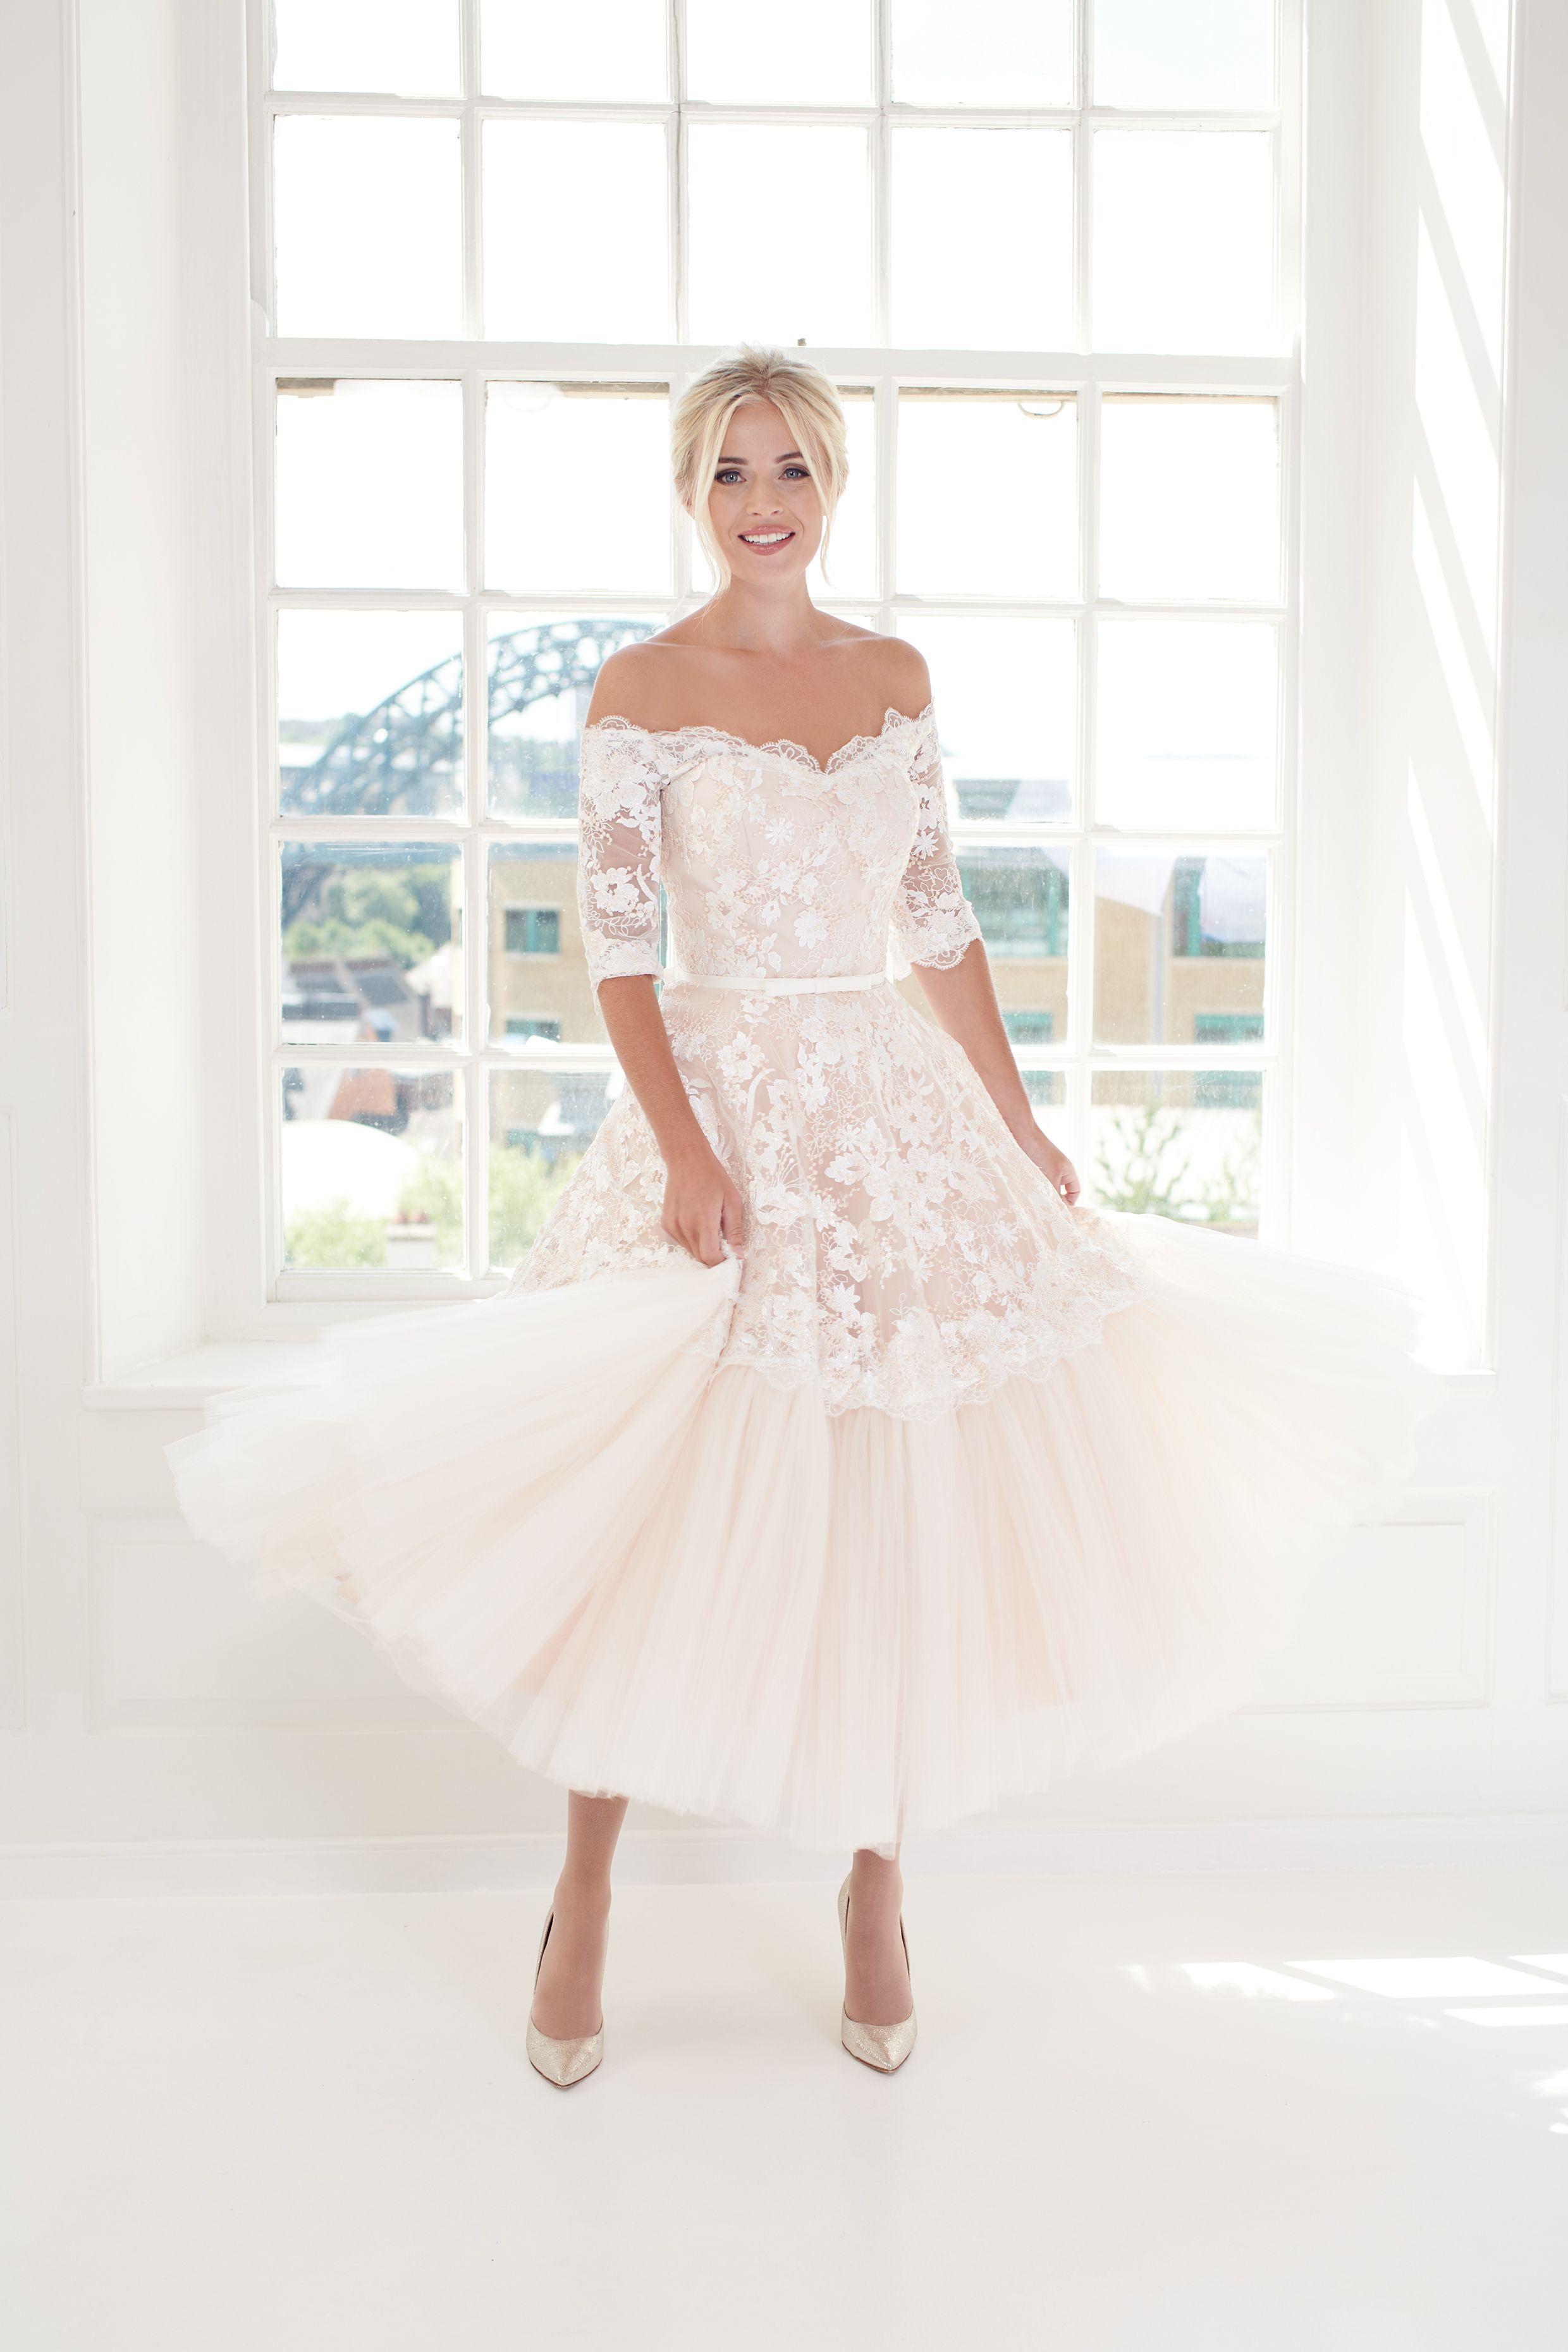 Dolores | Blush pink wedding dress, Short wedding dress ...